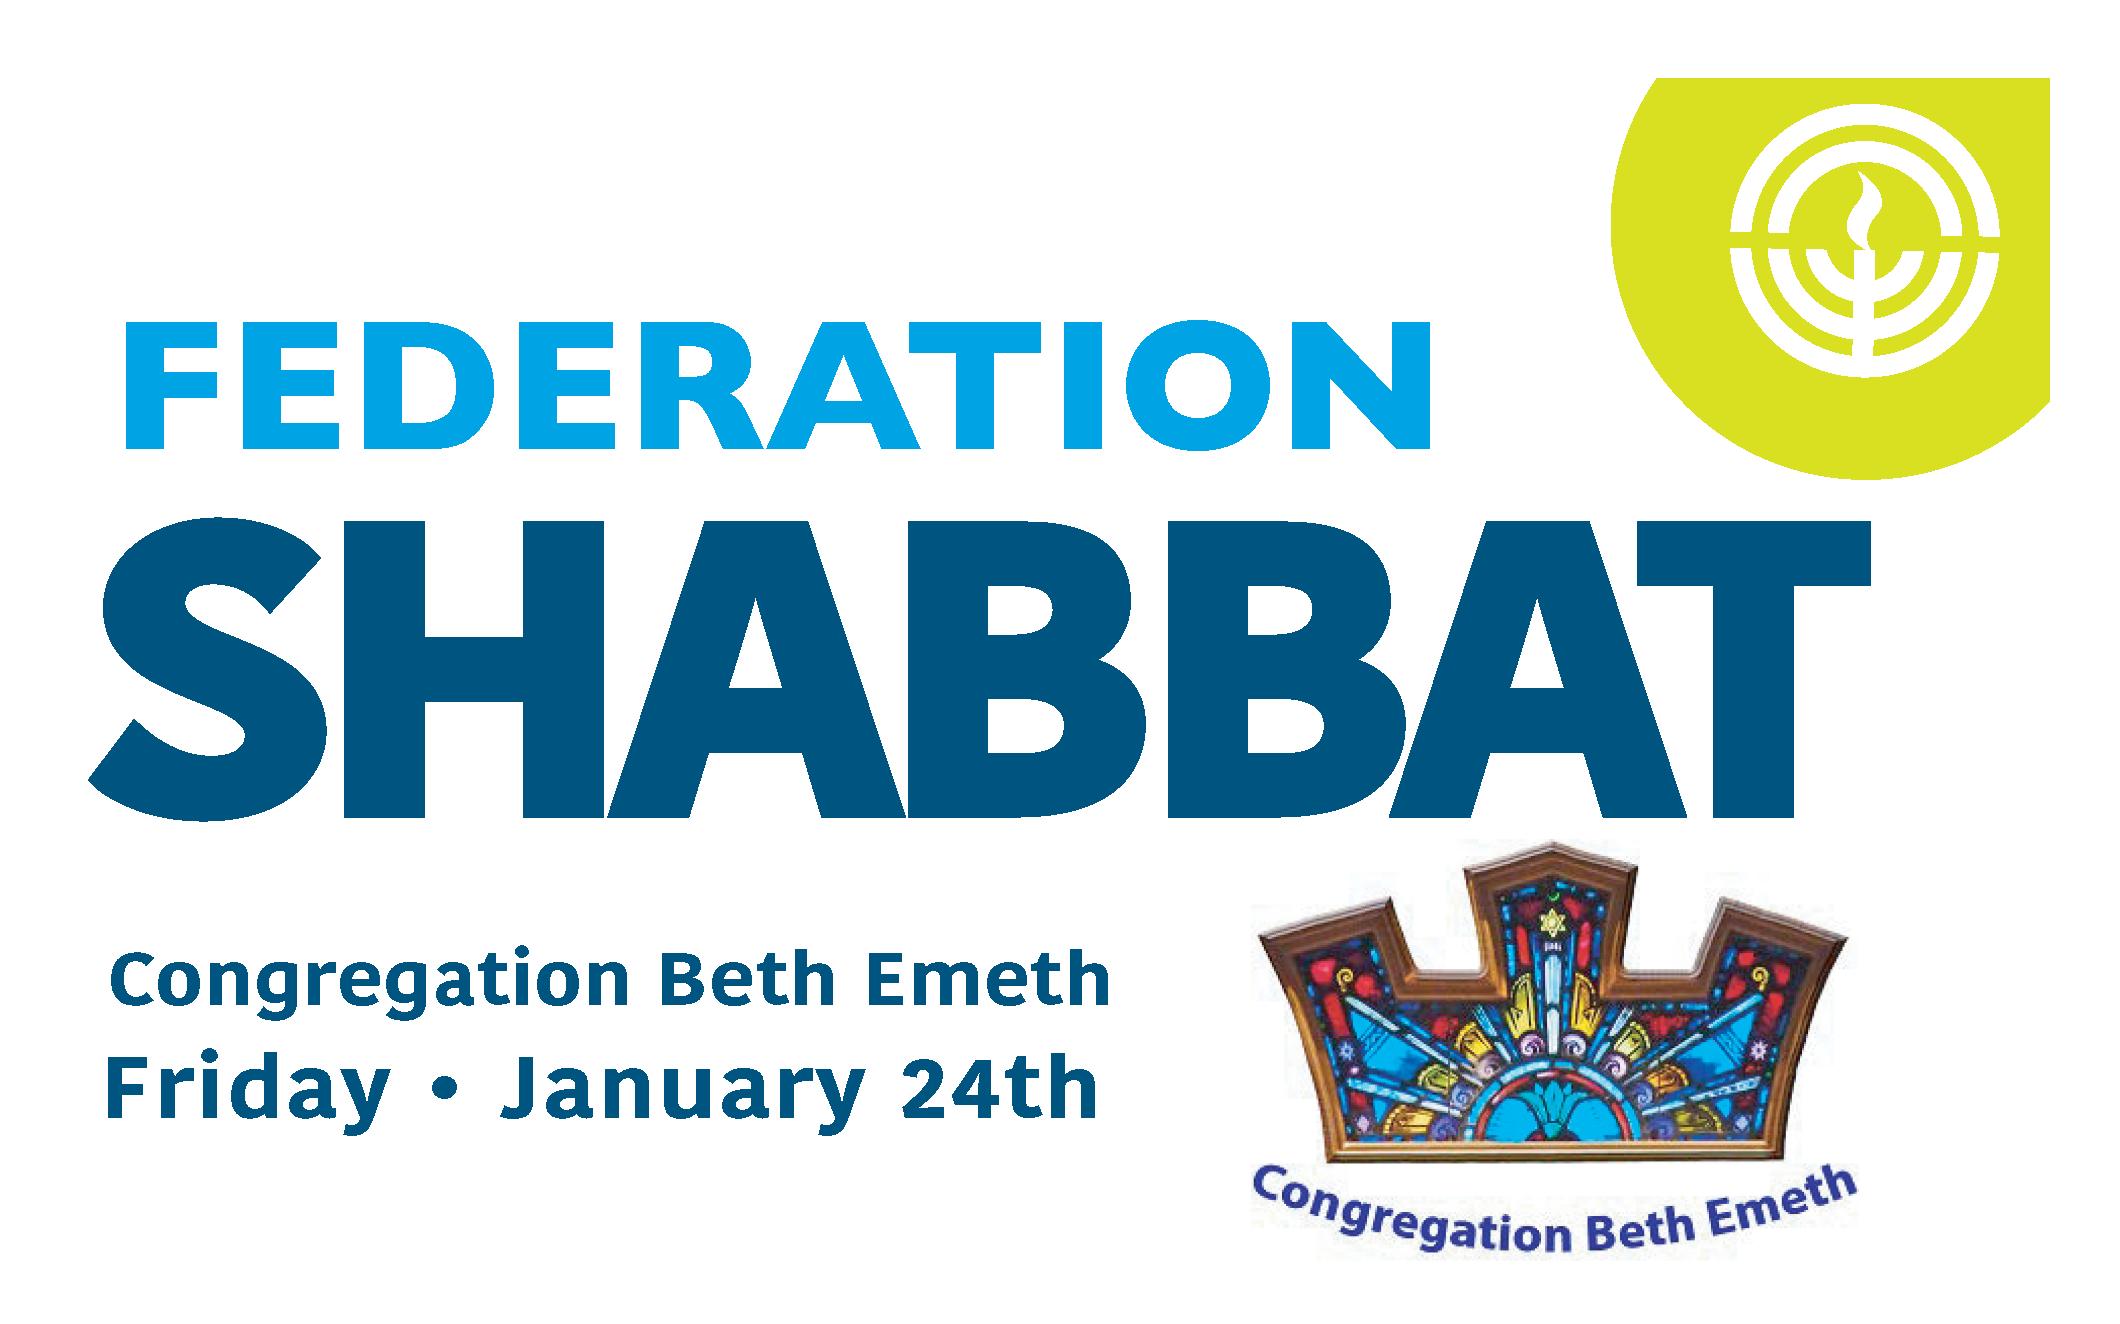 Federation Shabbat